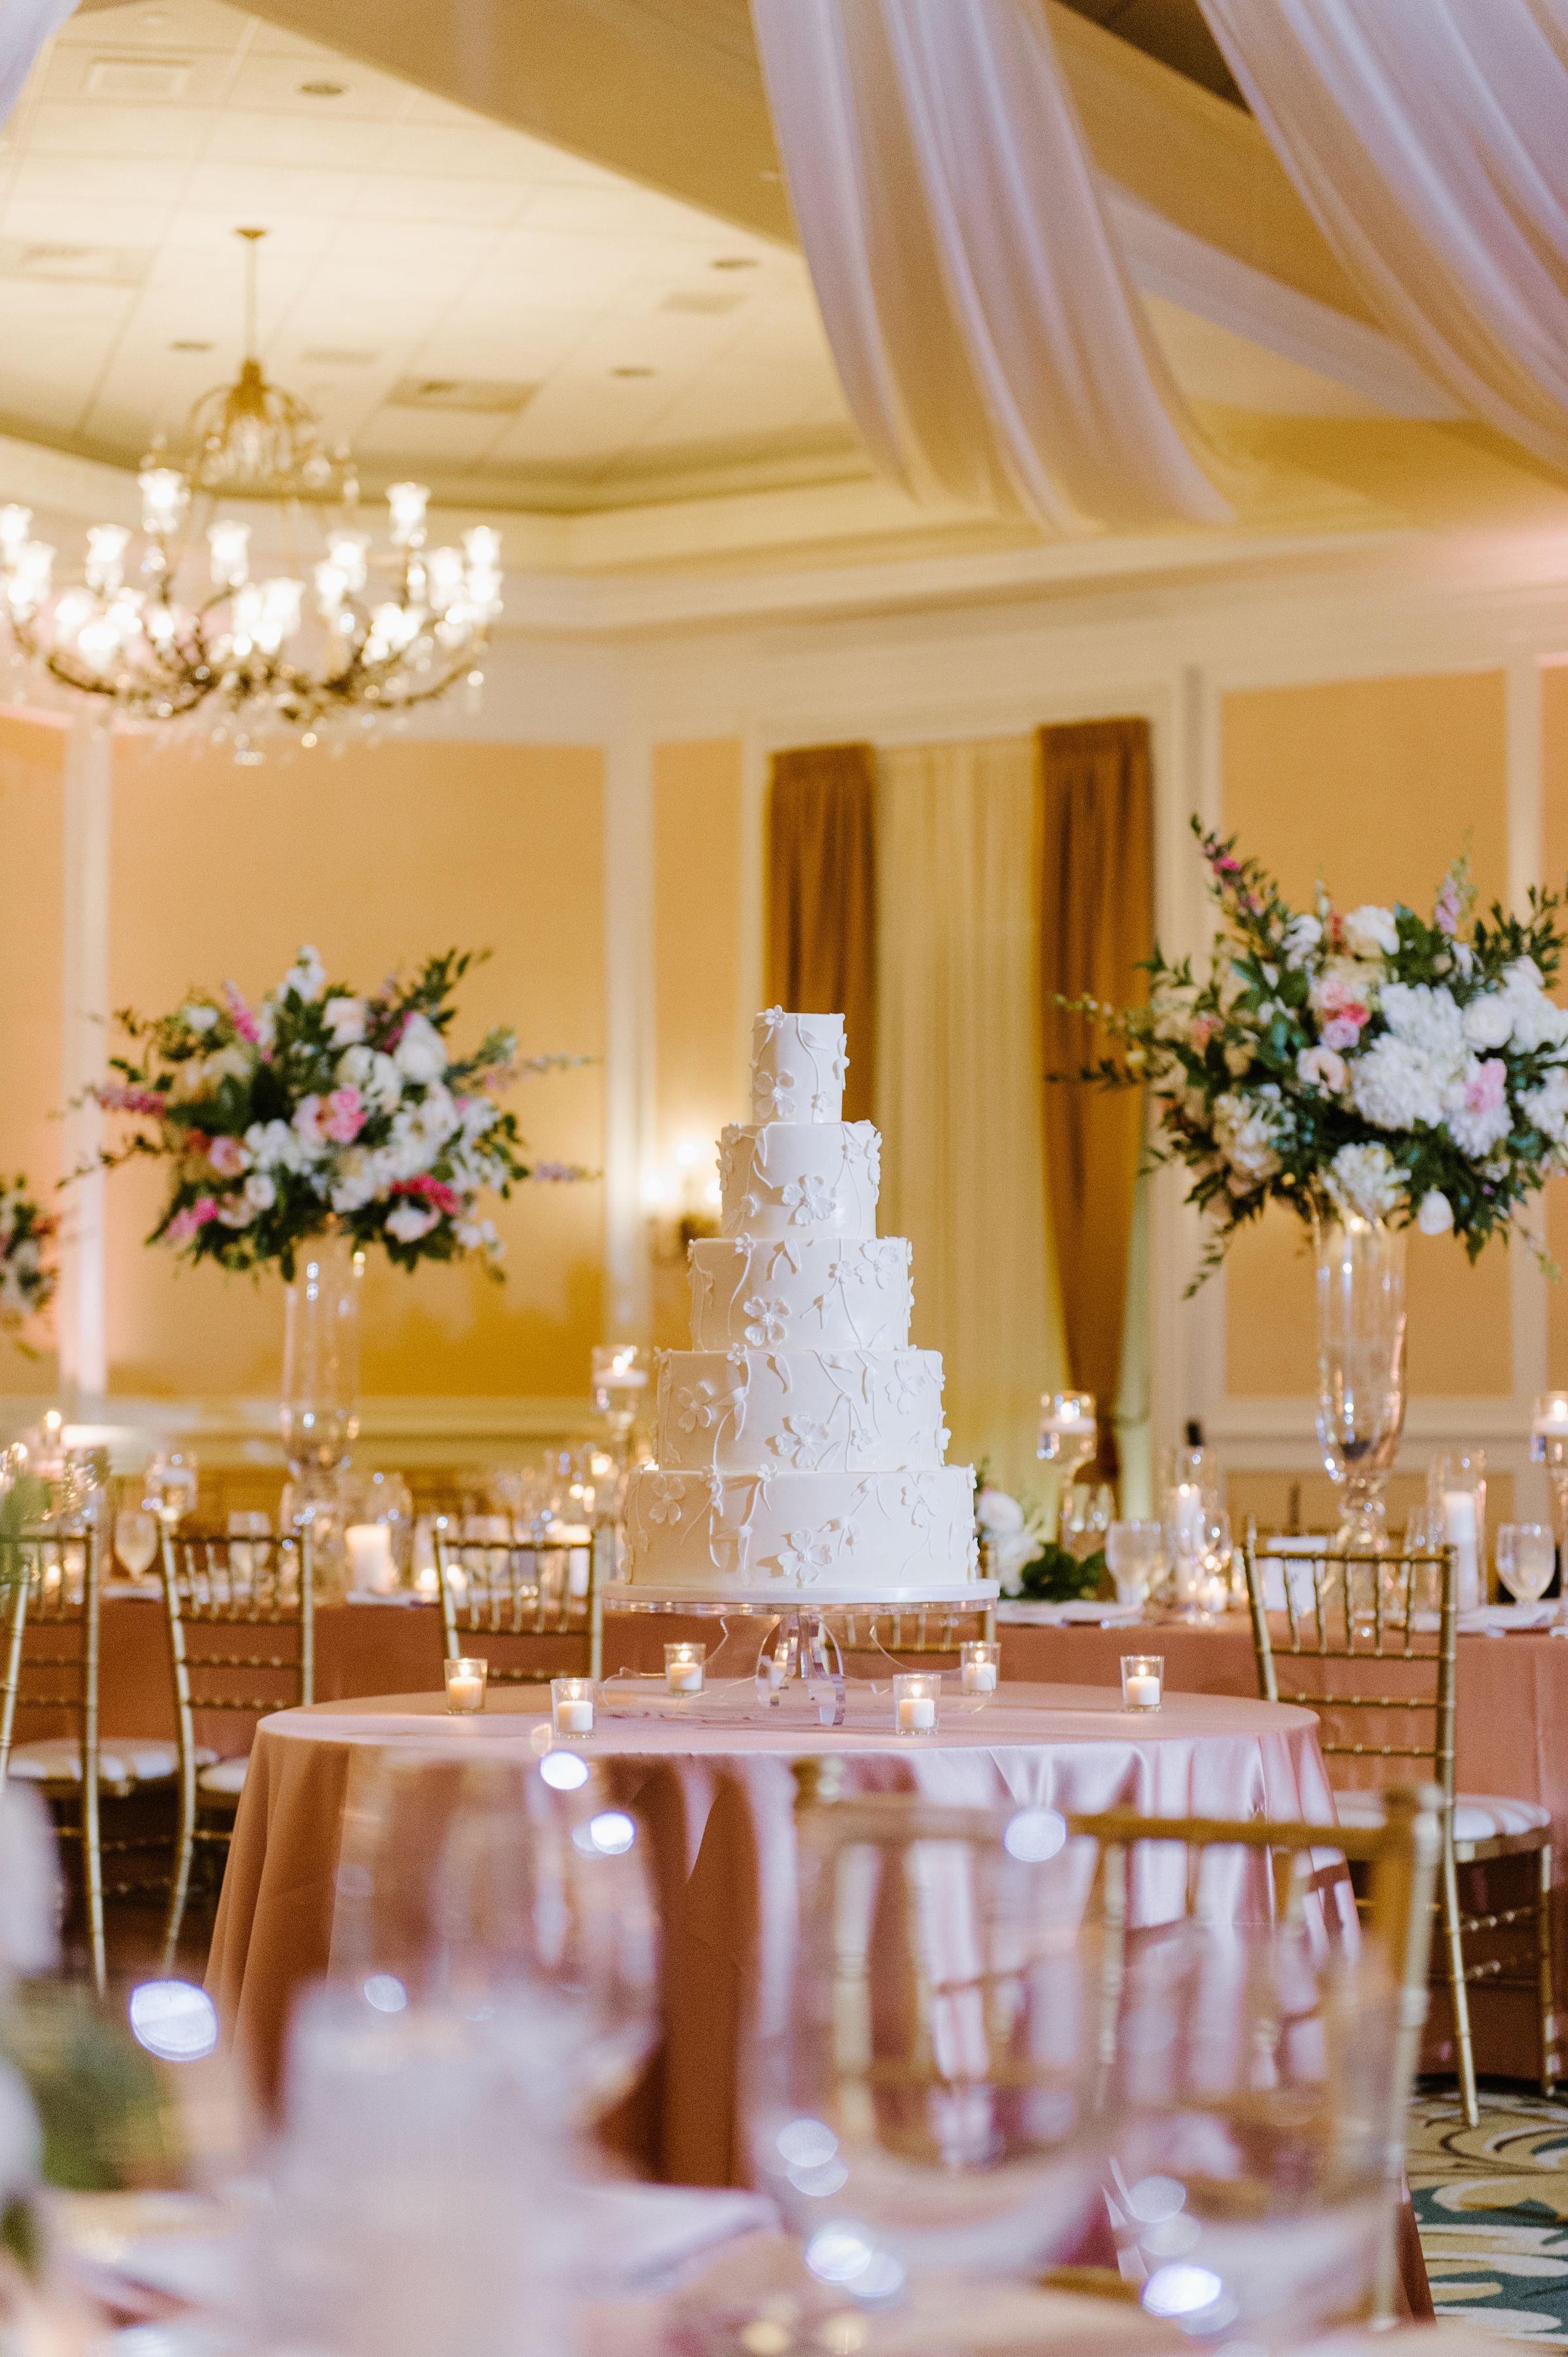 McElravey_Wedding_CarolineLimaPhotography_2018_282.jpg